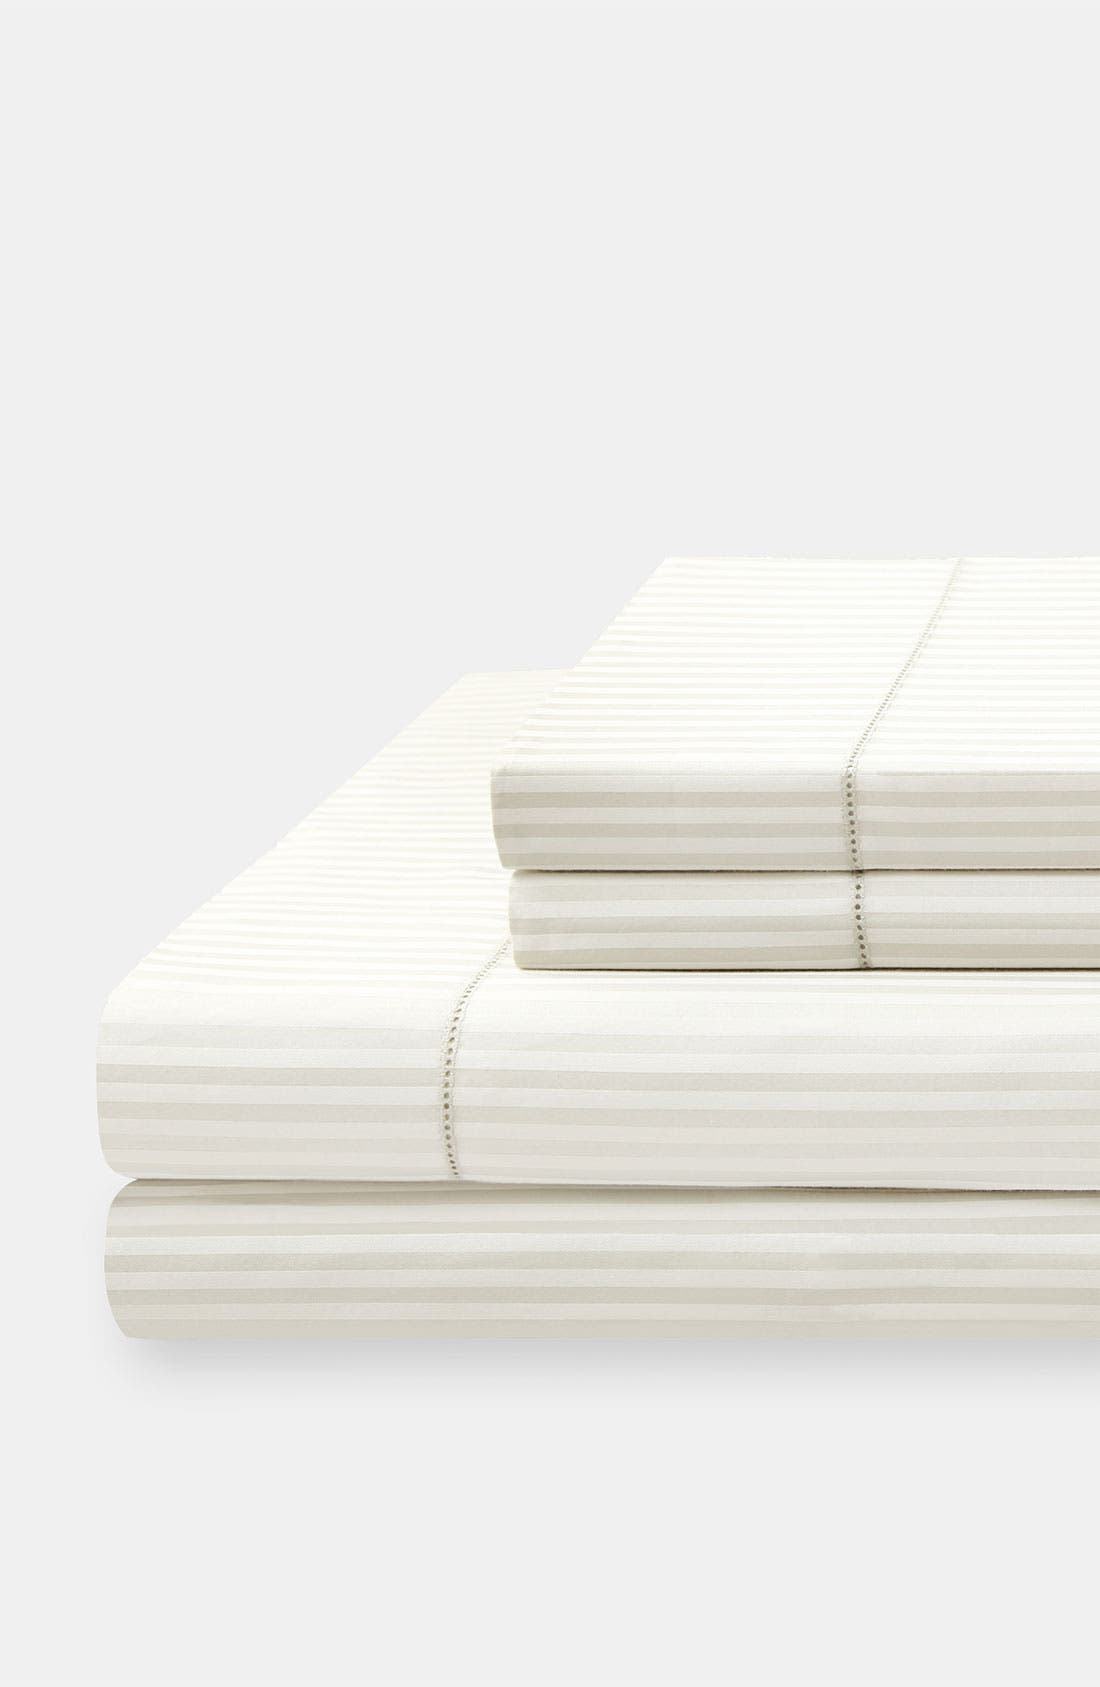 Alternate Image 1 Selected - kate spade new york 'magnolia park' pillowcase (set of 2)